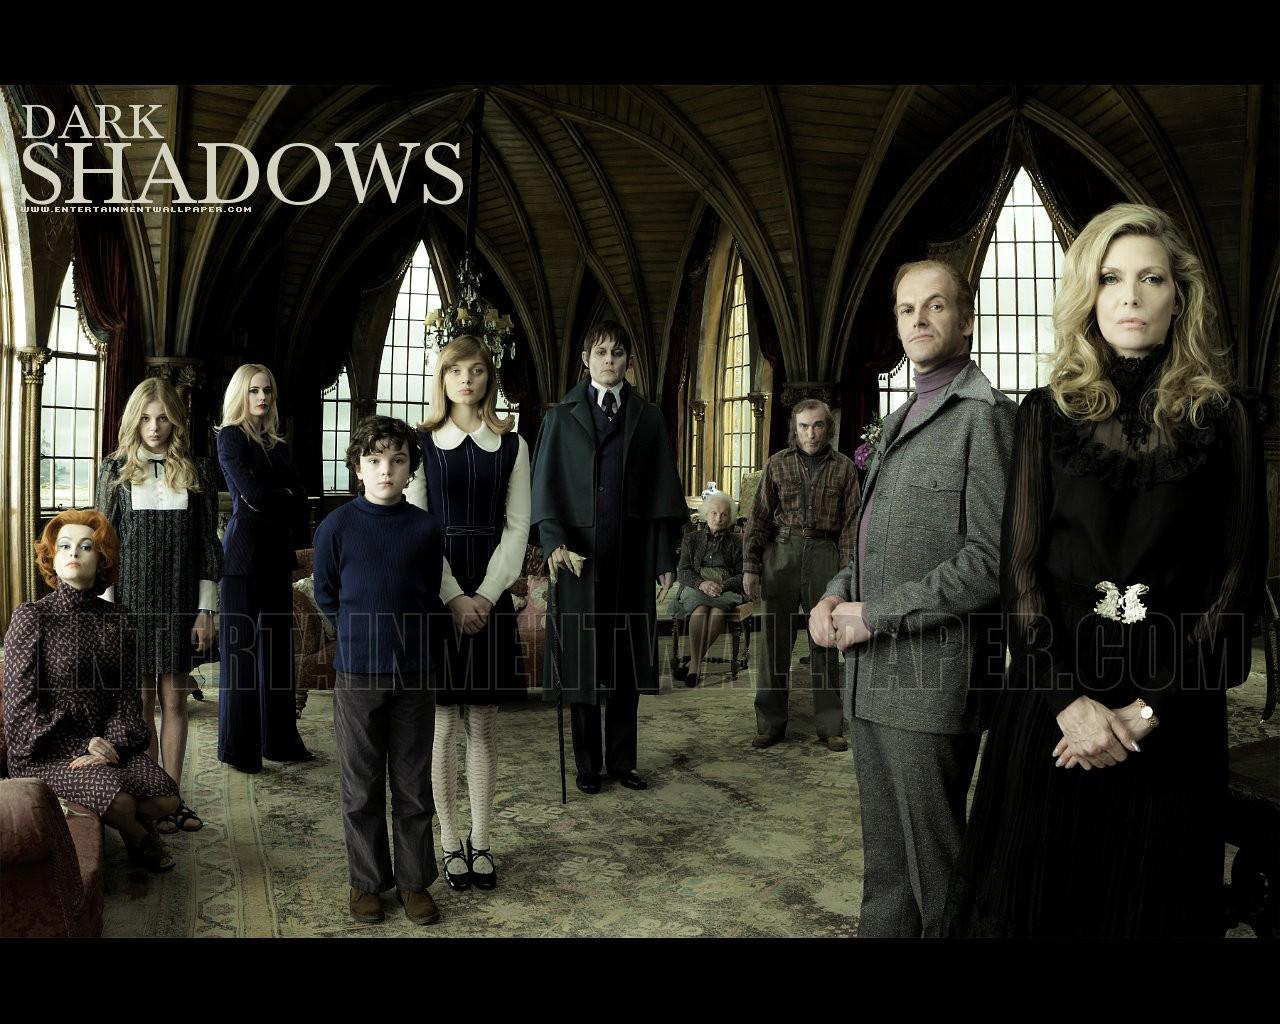 dark shadows wallpaper 10030473 size 1280x1024 more dark shadows 1280x1024